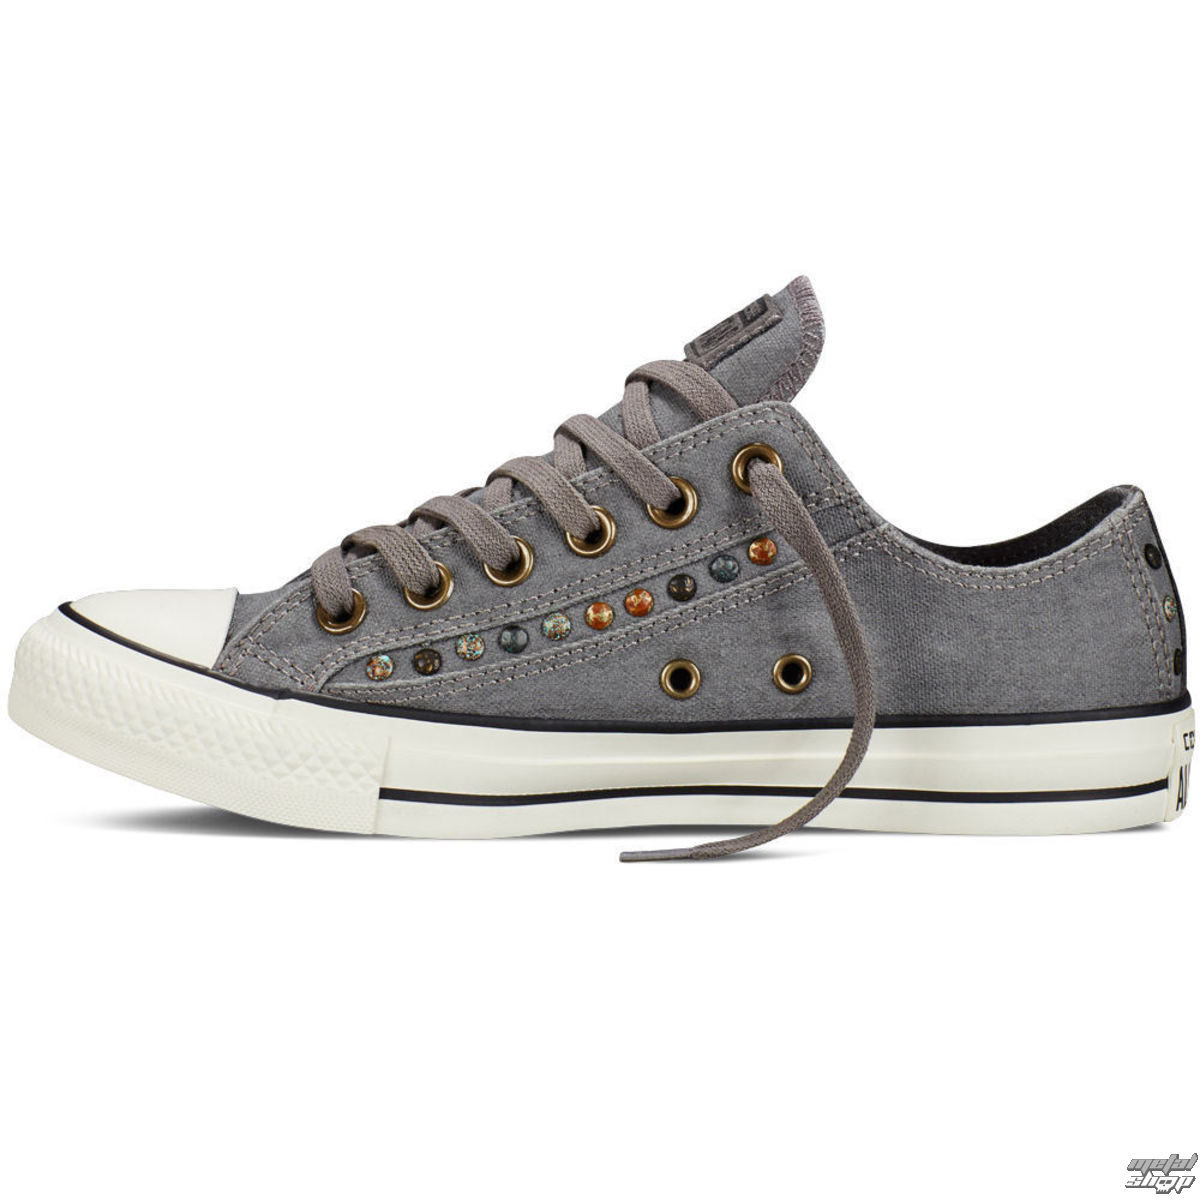 rövidszárú cipő női - CONVERSE - C551569 - Metalshop.hu 52549ff4ed